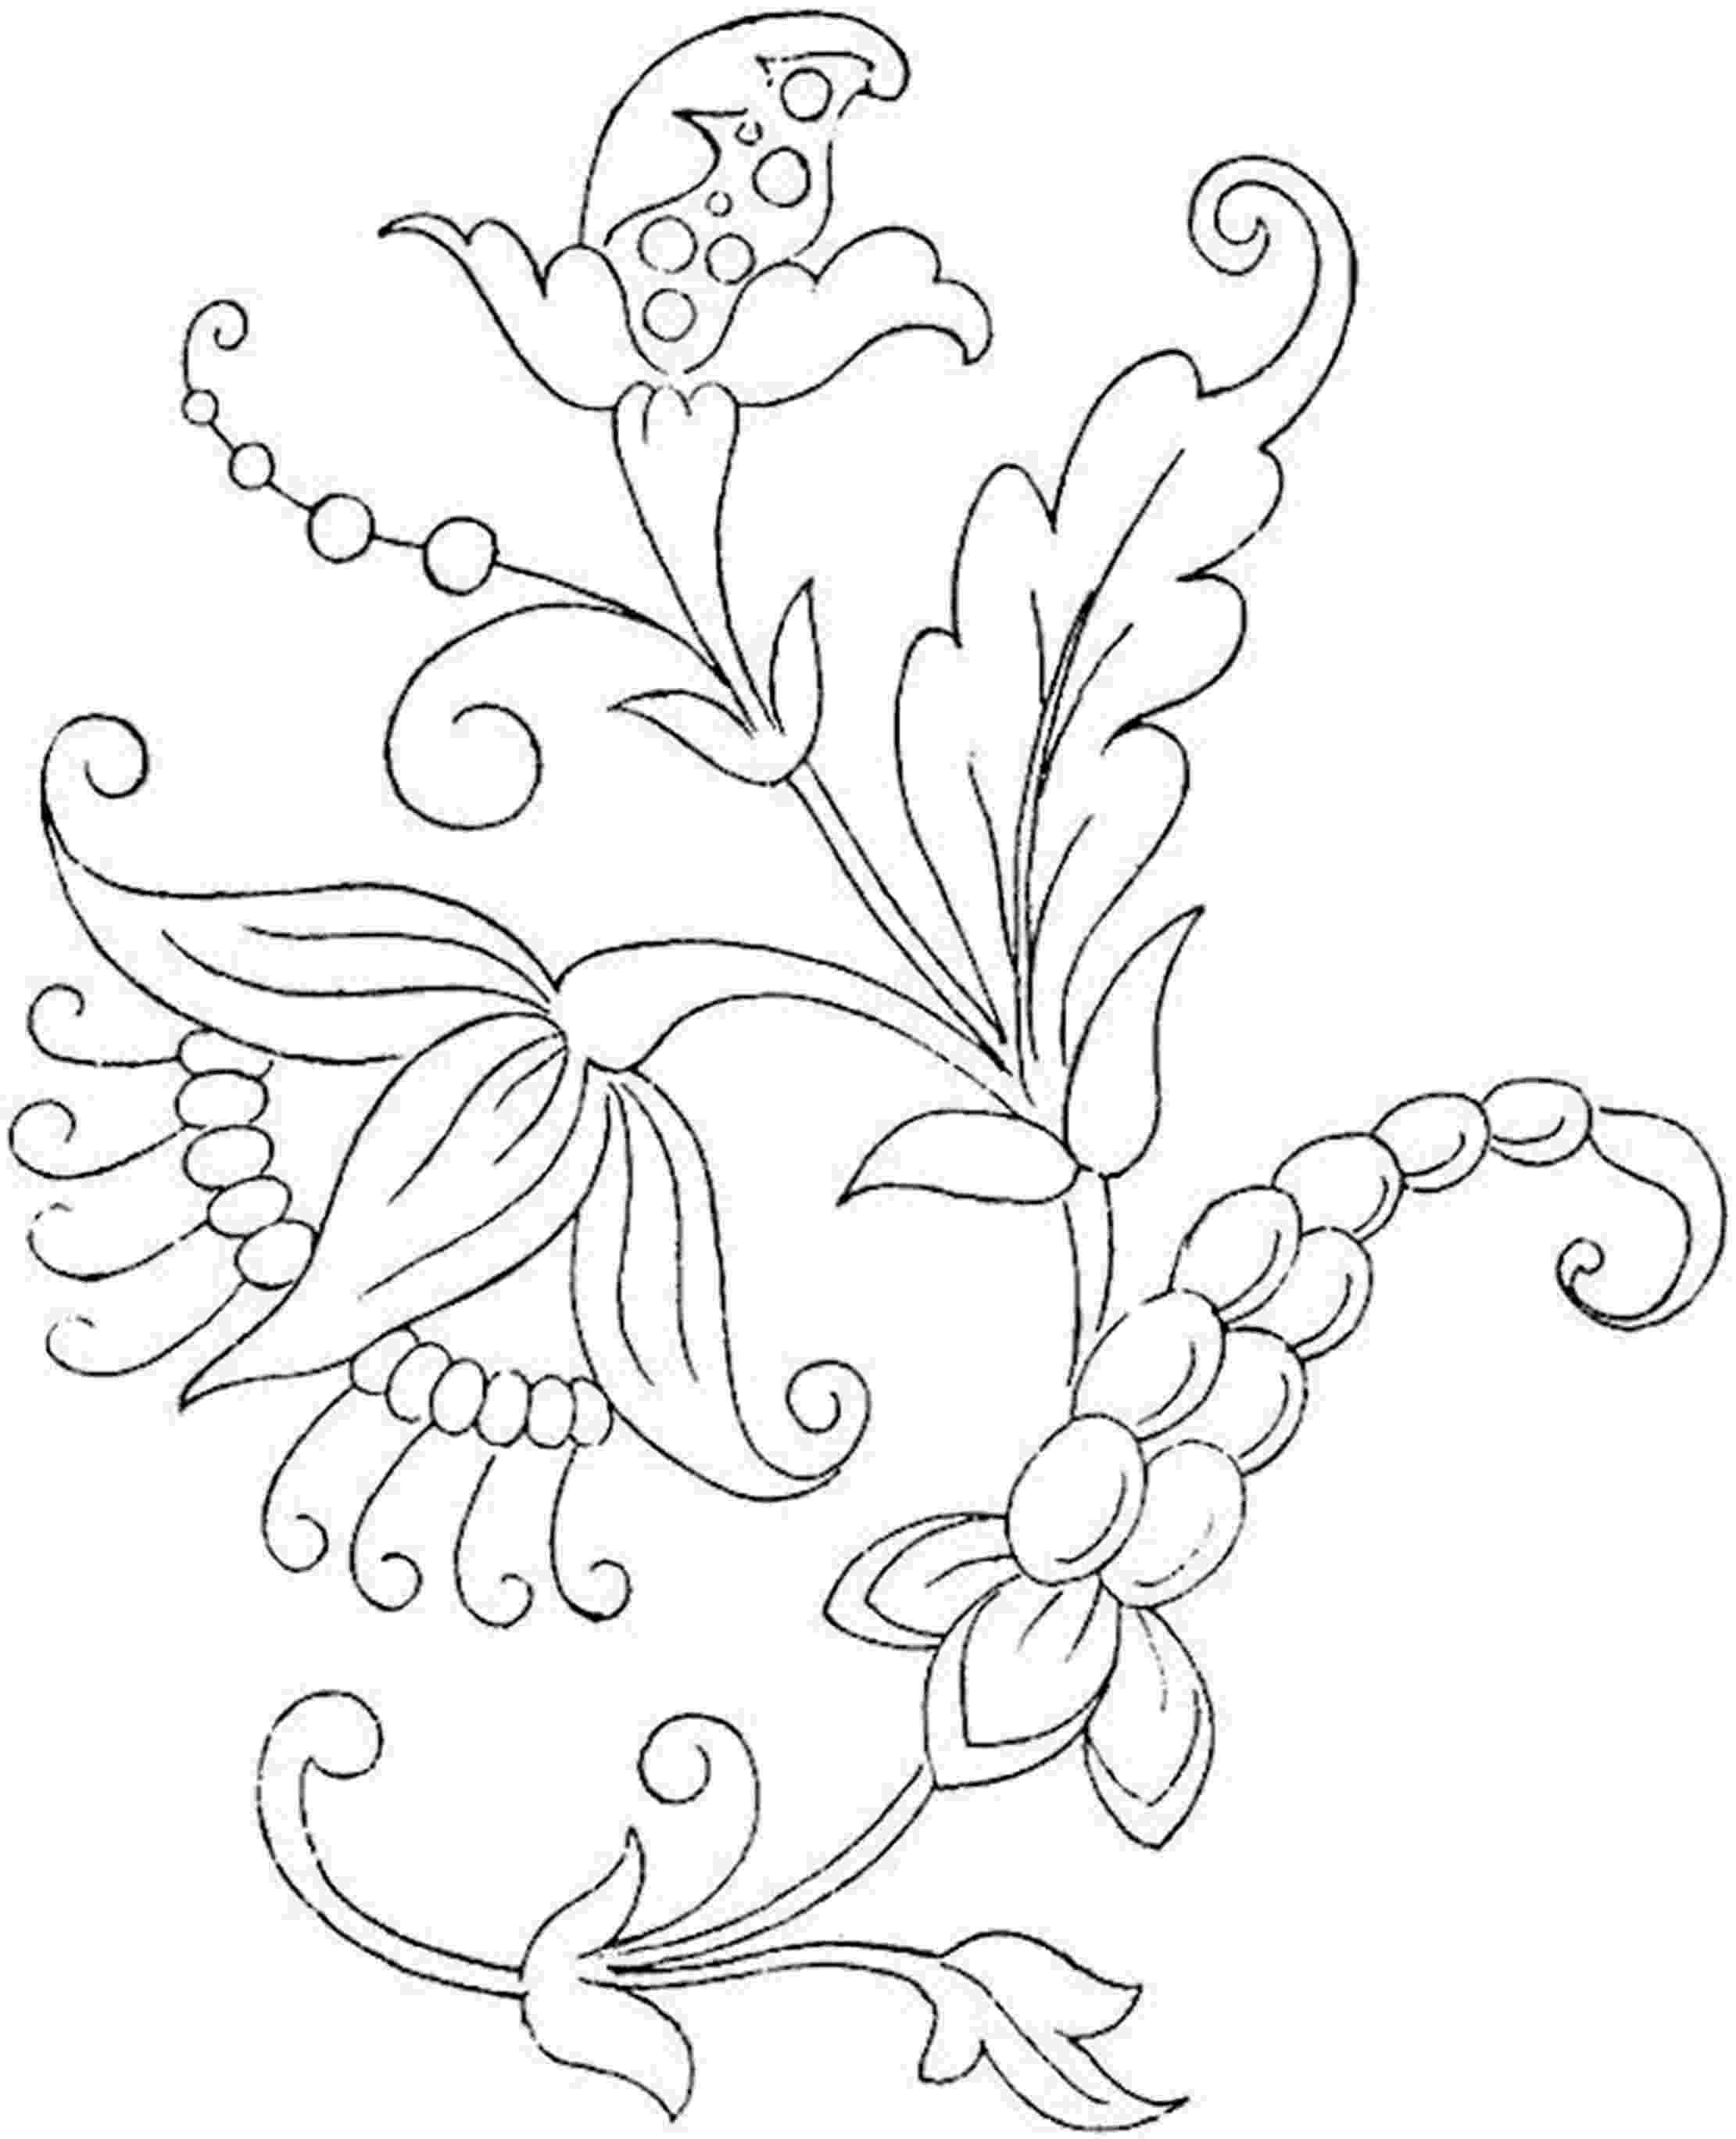 coloring patterns flowers 25 flower mandala printable coloring page by printbliss coloring flowers patterns